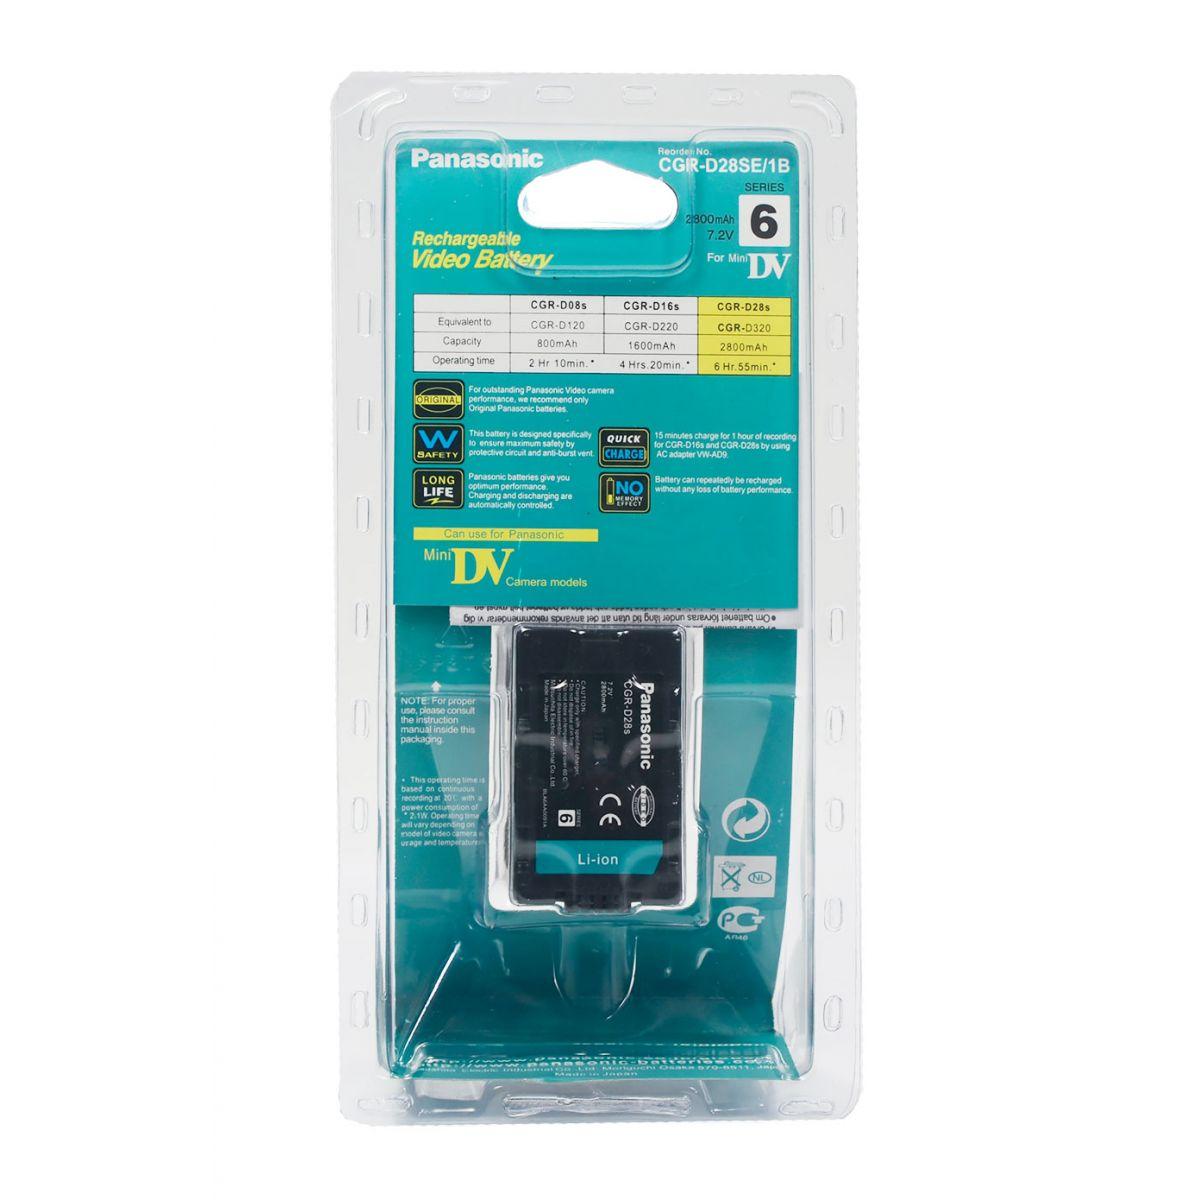 Bateria Panasonic Cgr-d28s - DVC15 DS11EN EX3